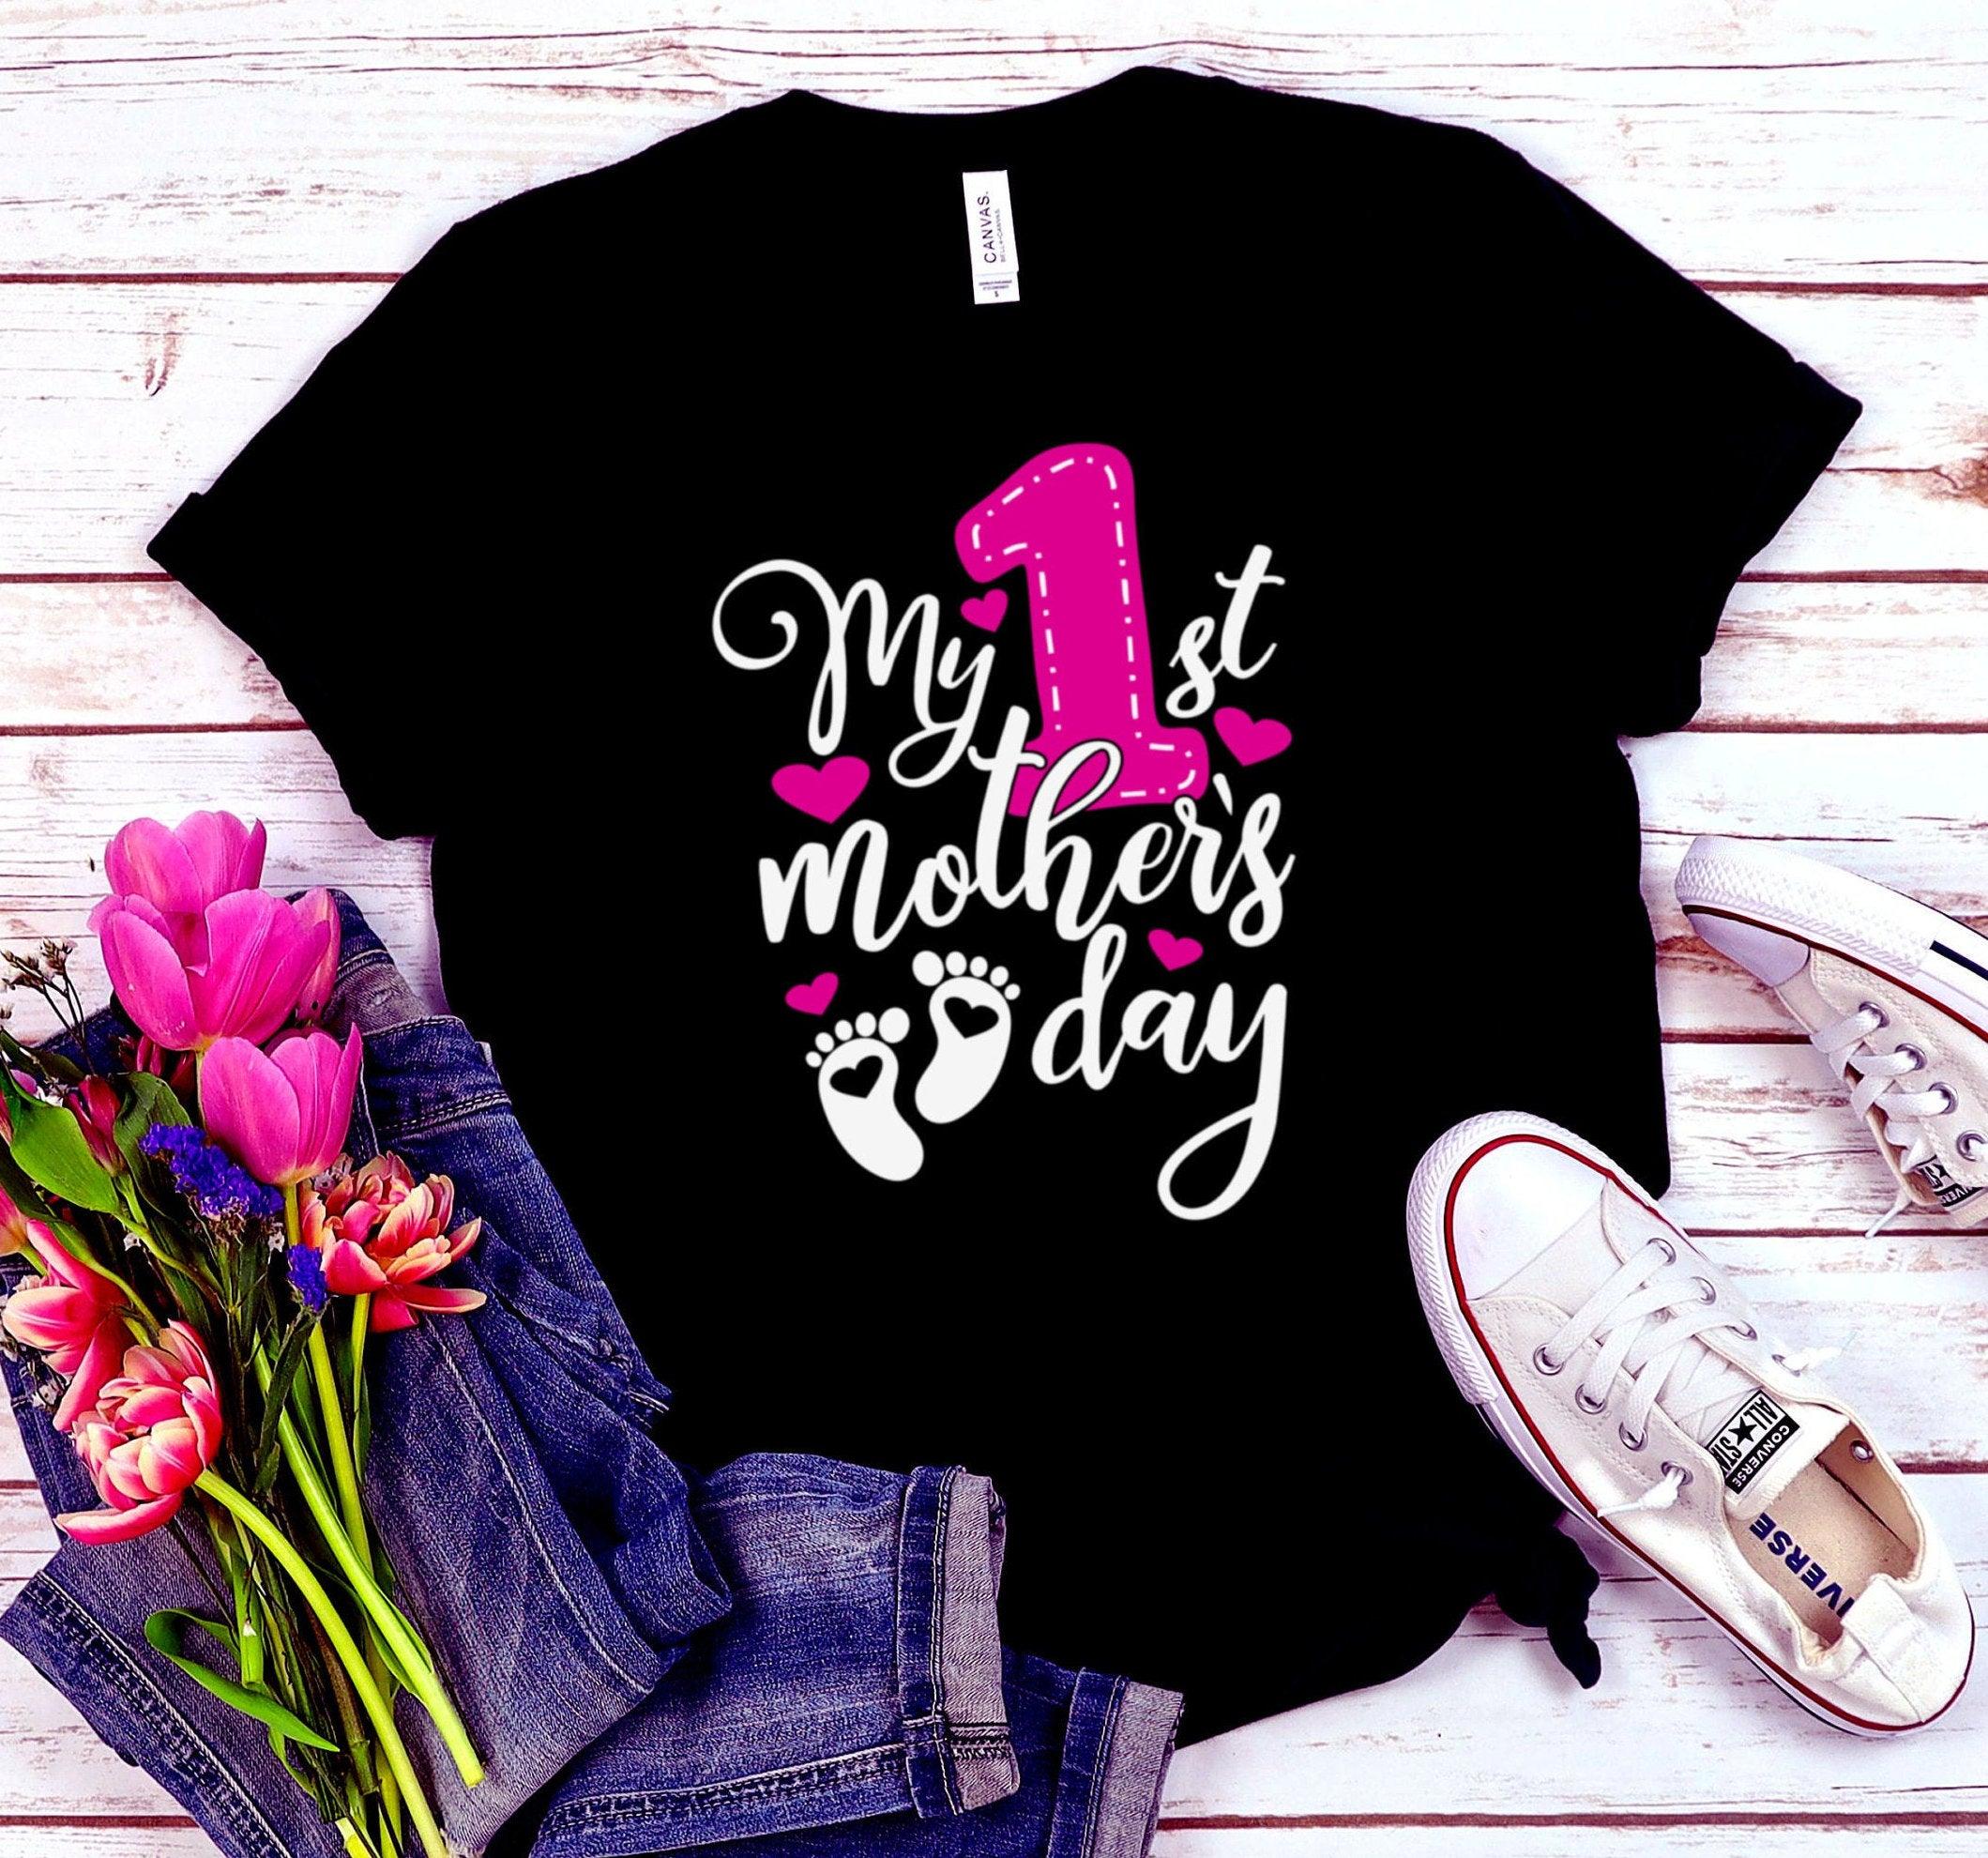 First-mothers-day-svg-new-baby-mothers-day-svg-new-baby-svg-love-mom-svg-motherhood-svg-mothers-day-svg-svg-cricut-svg-605139a9